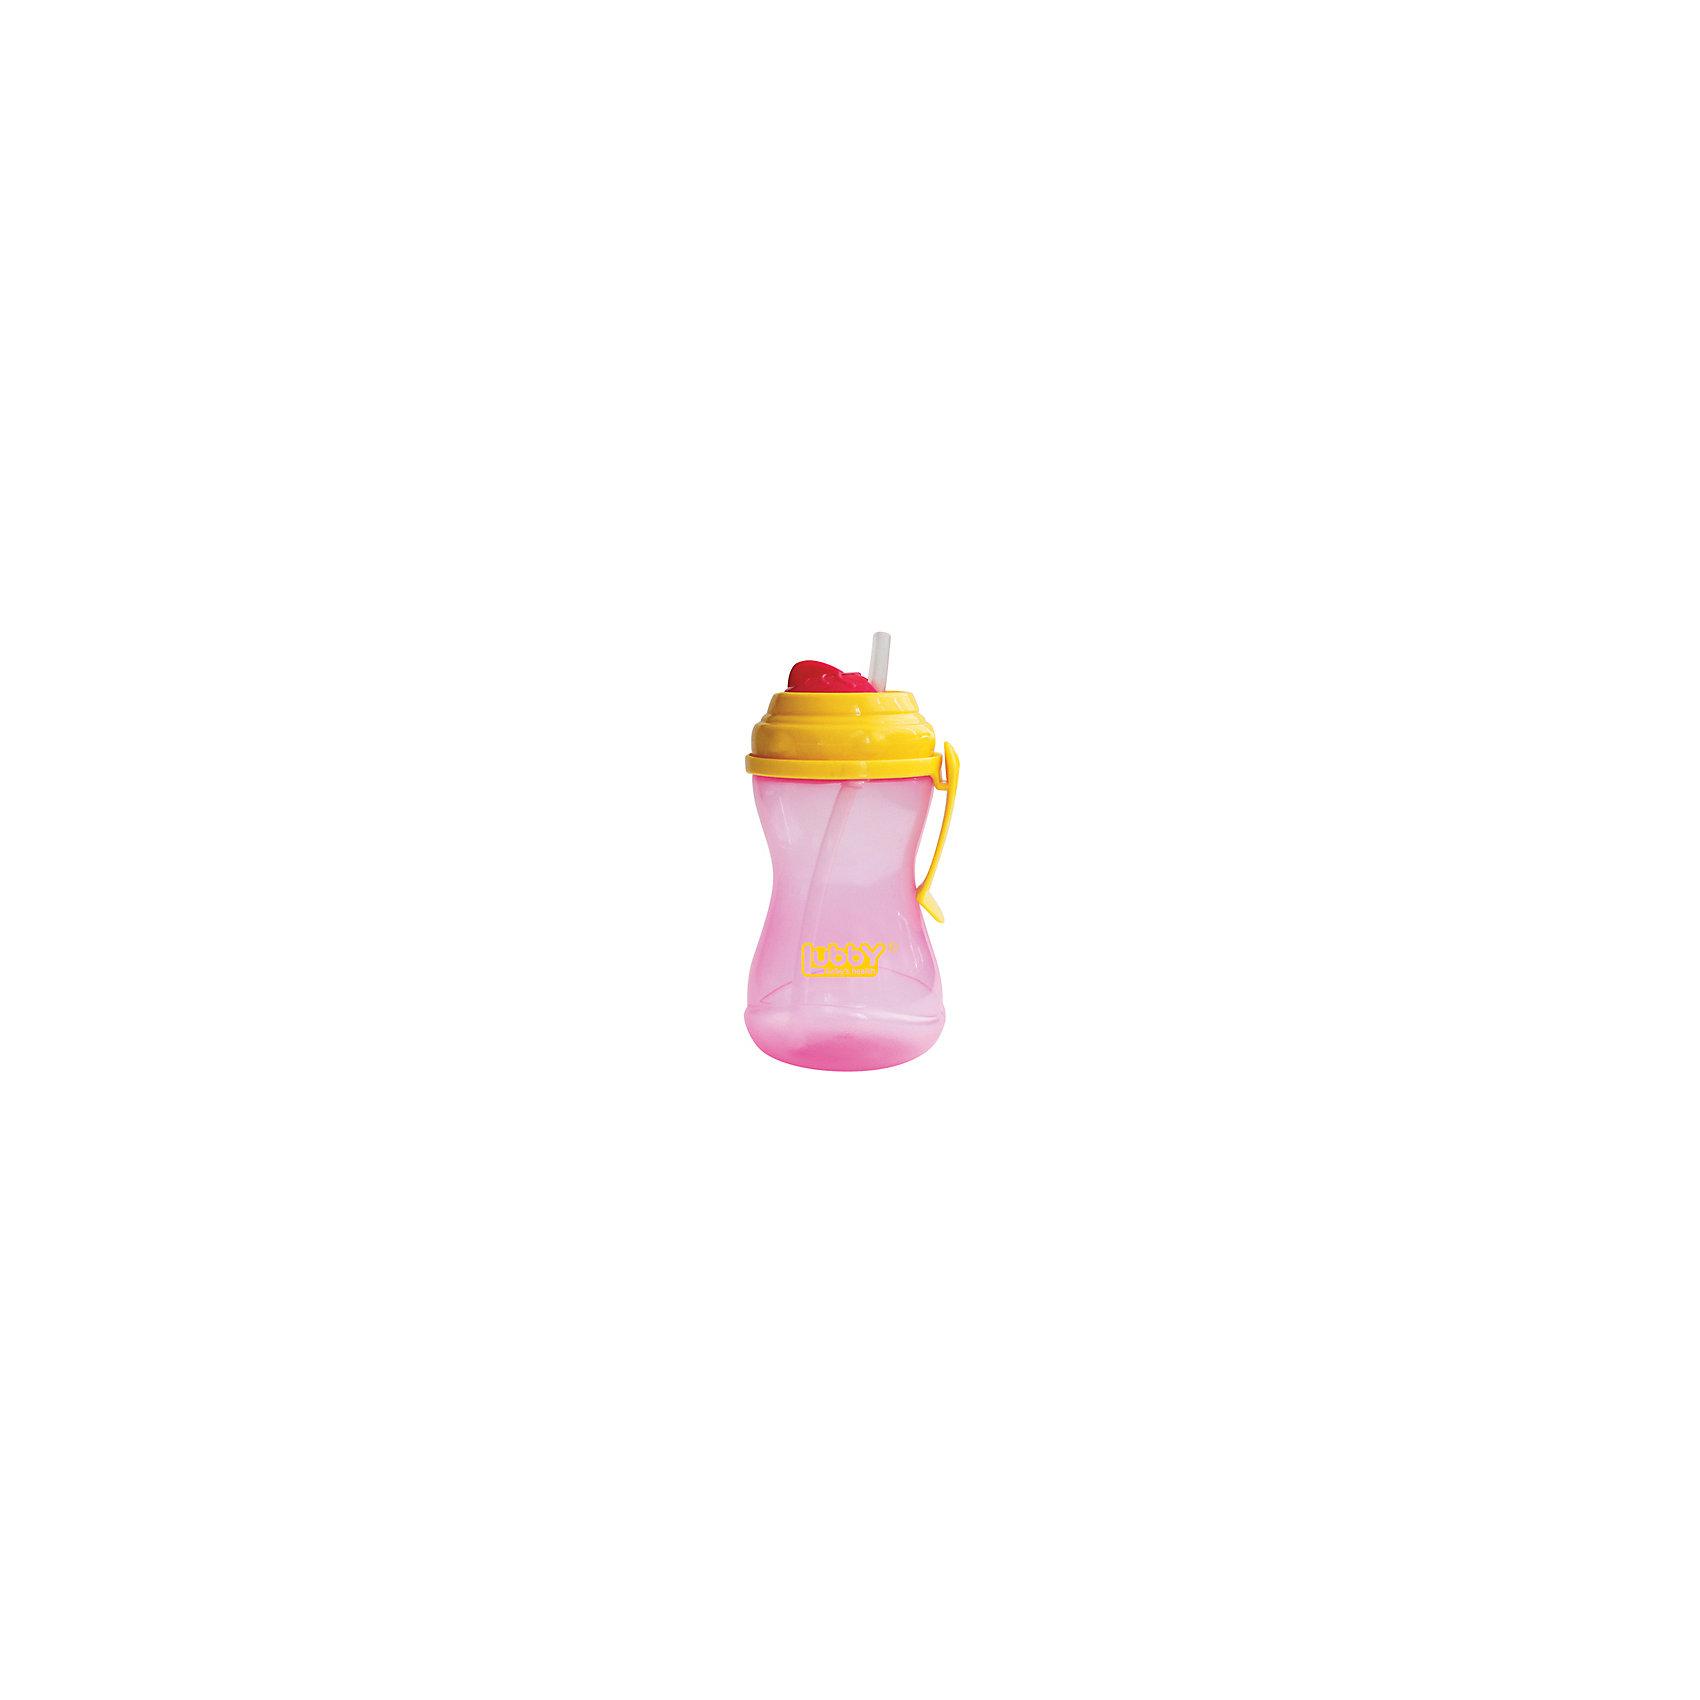 LUBBY Поильник-непроливайка Twist с трубочкой от 6 мес., 320 мл., LUBBY, розовый pigeon чашка поильник mag mag с трубочкой зеленый с 8 мес 200 мл